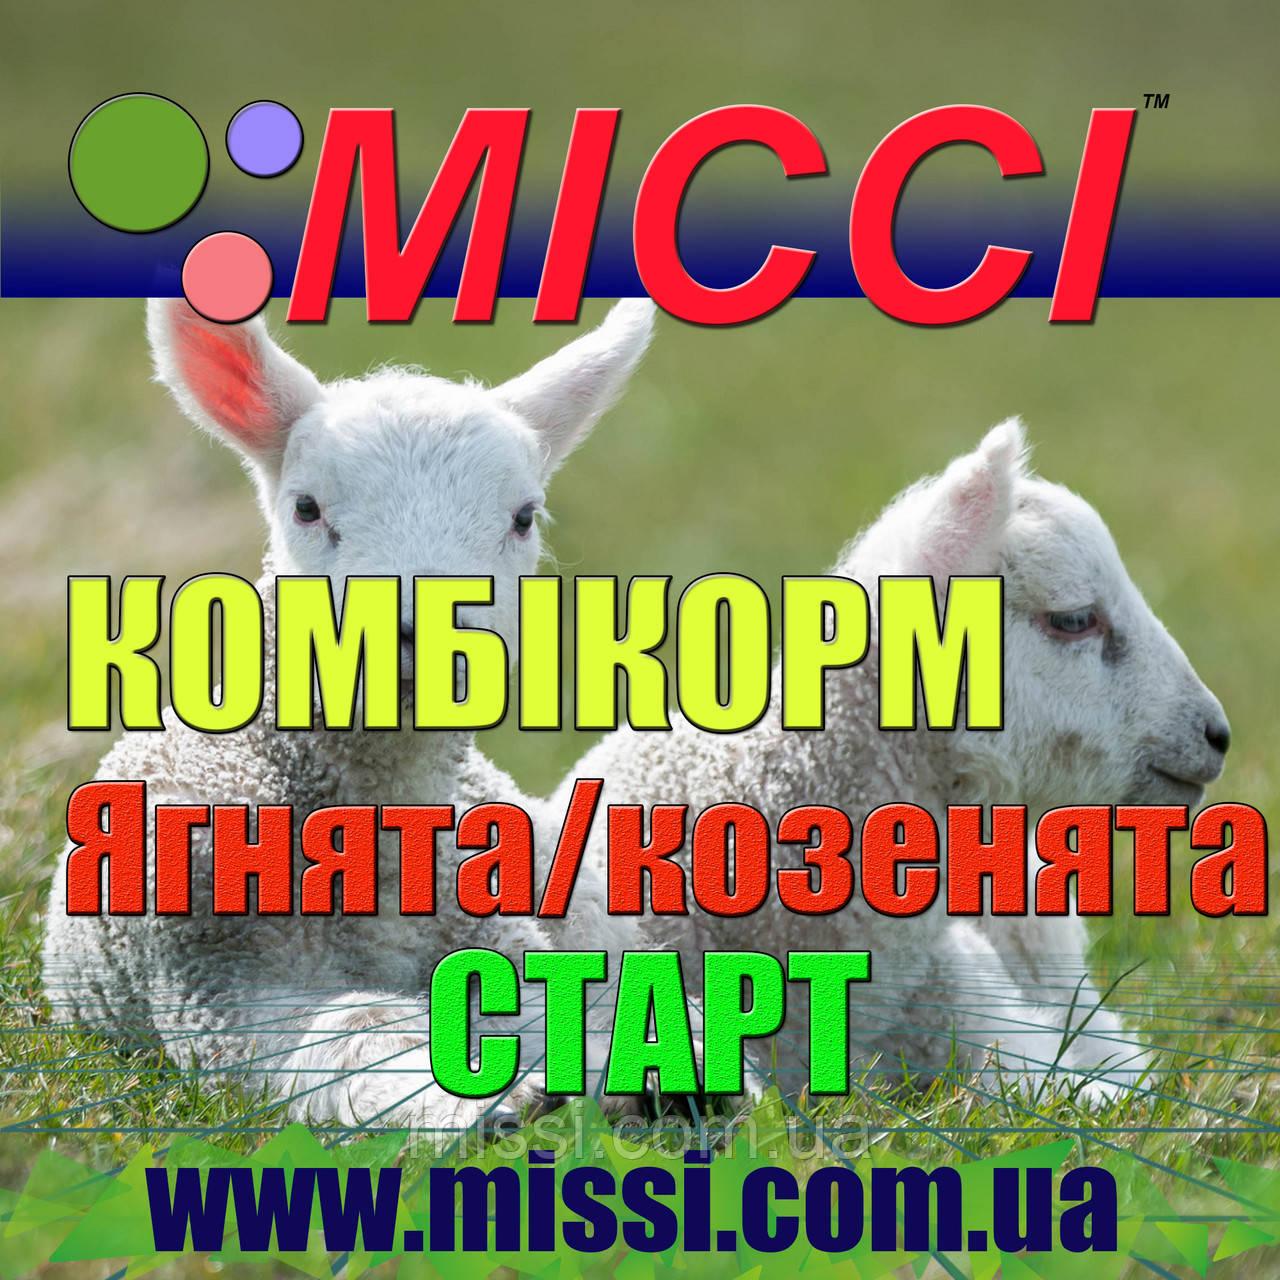 Комбикорм для коз и ягнят СТАРТ (1,5-4 месяца), Мисси